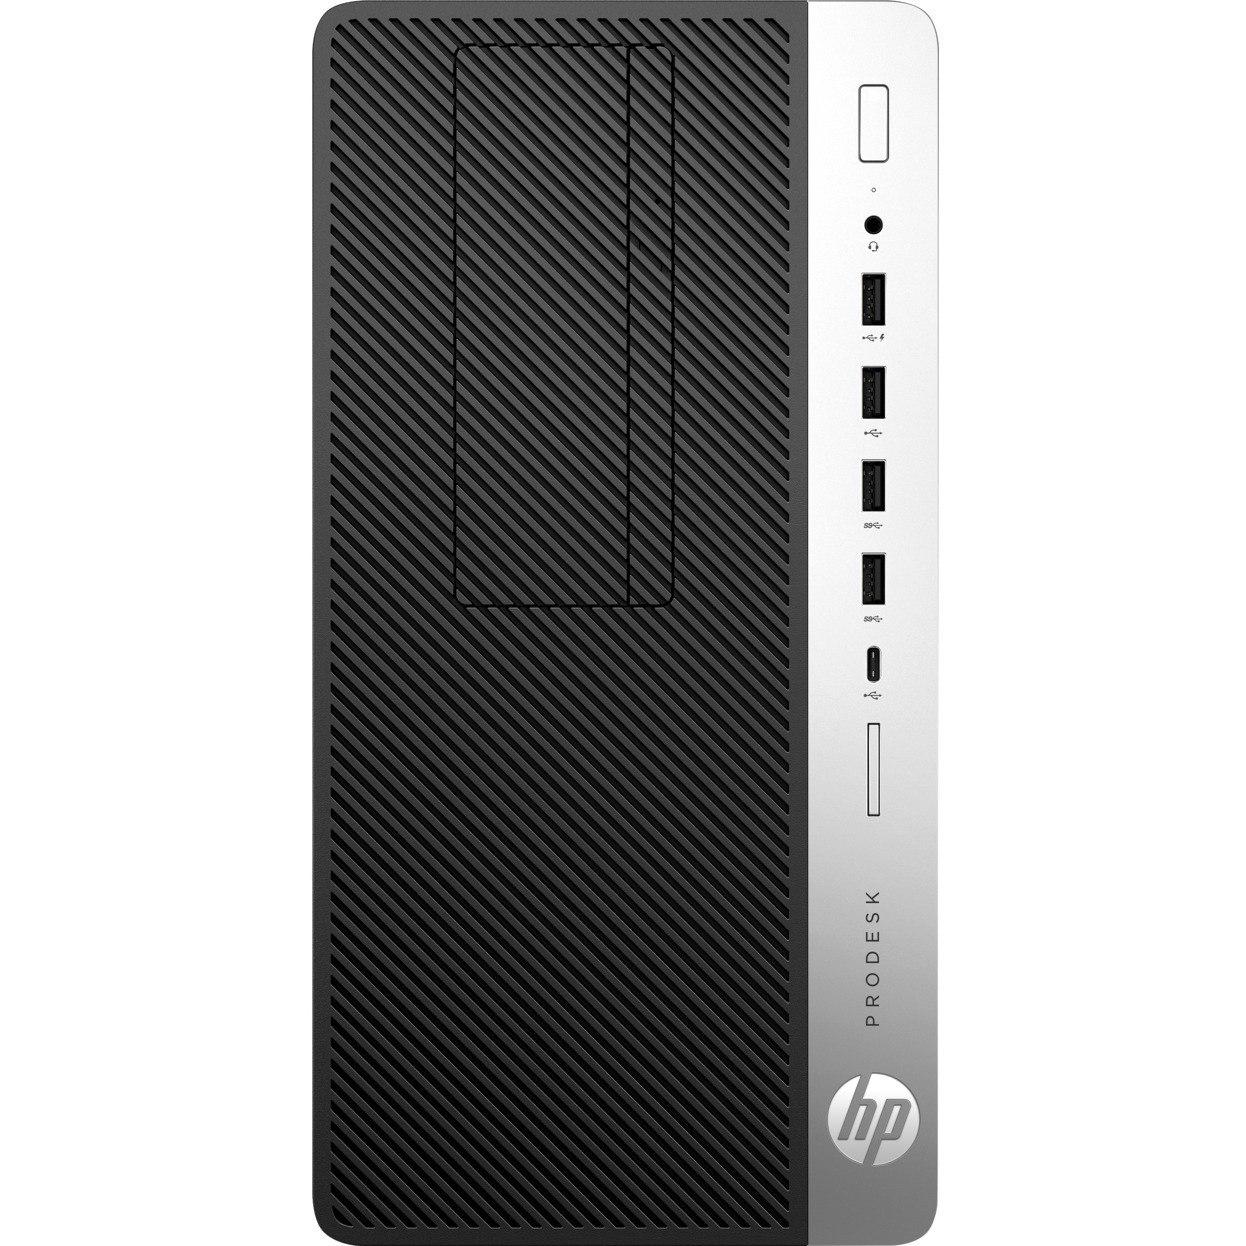 HP Business Desktop ProDesk 600 G3 Desktop Computer - Intel Core i5 (7th Gen) i5-7500 3.40 GHz - 8 GB DDR4 SDRAM - 1 TB HDD - Windows 10 Pro 64-bit - Micro Tower